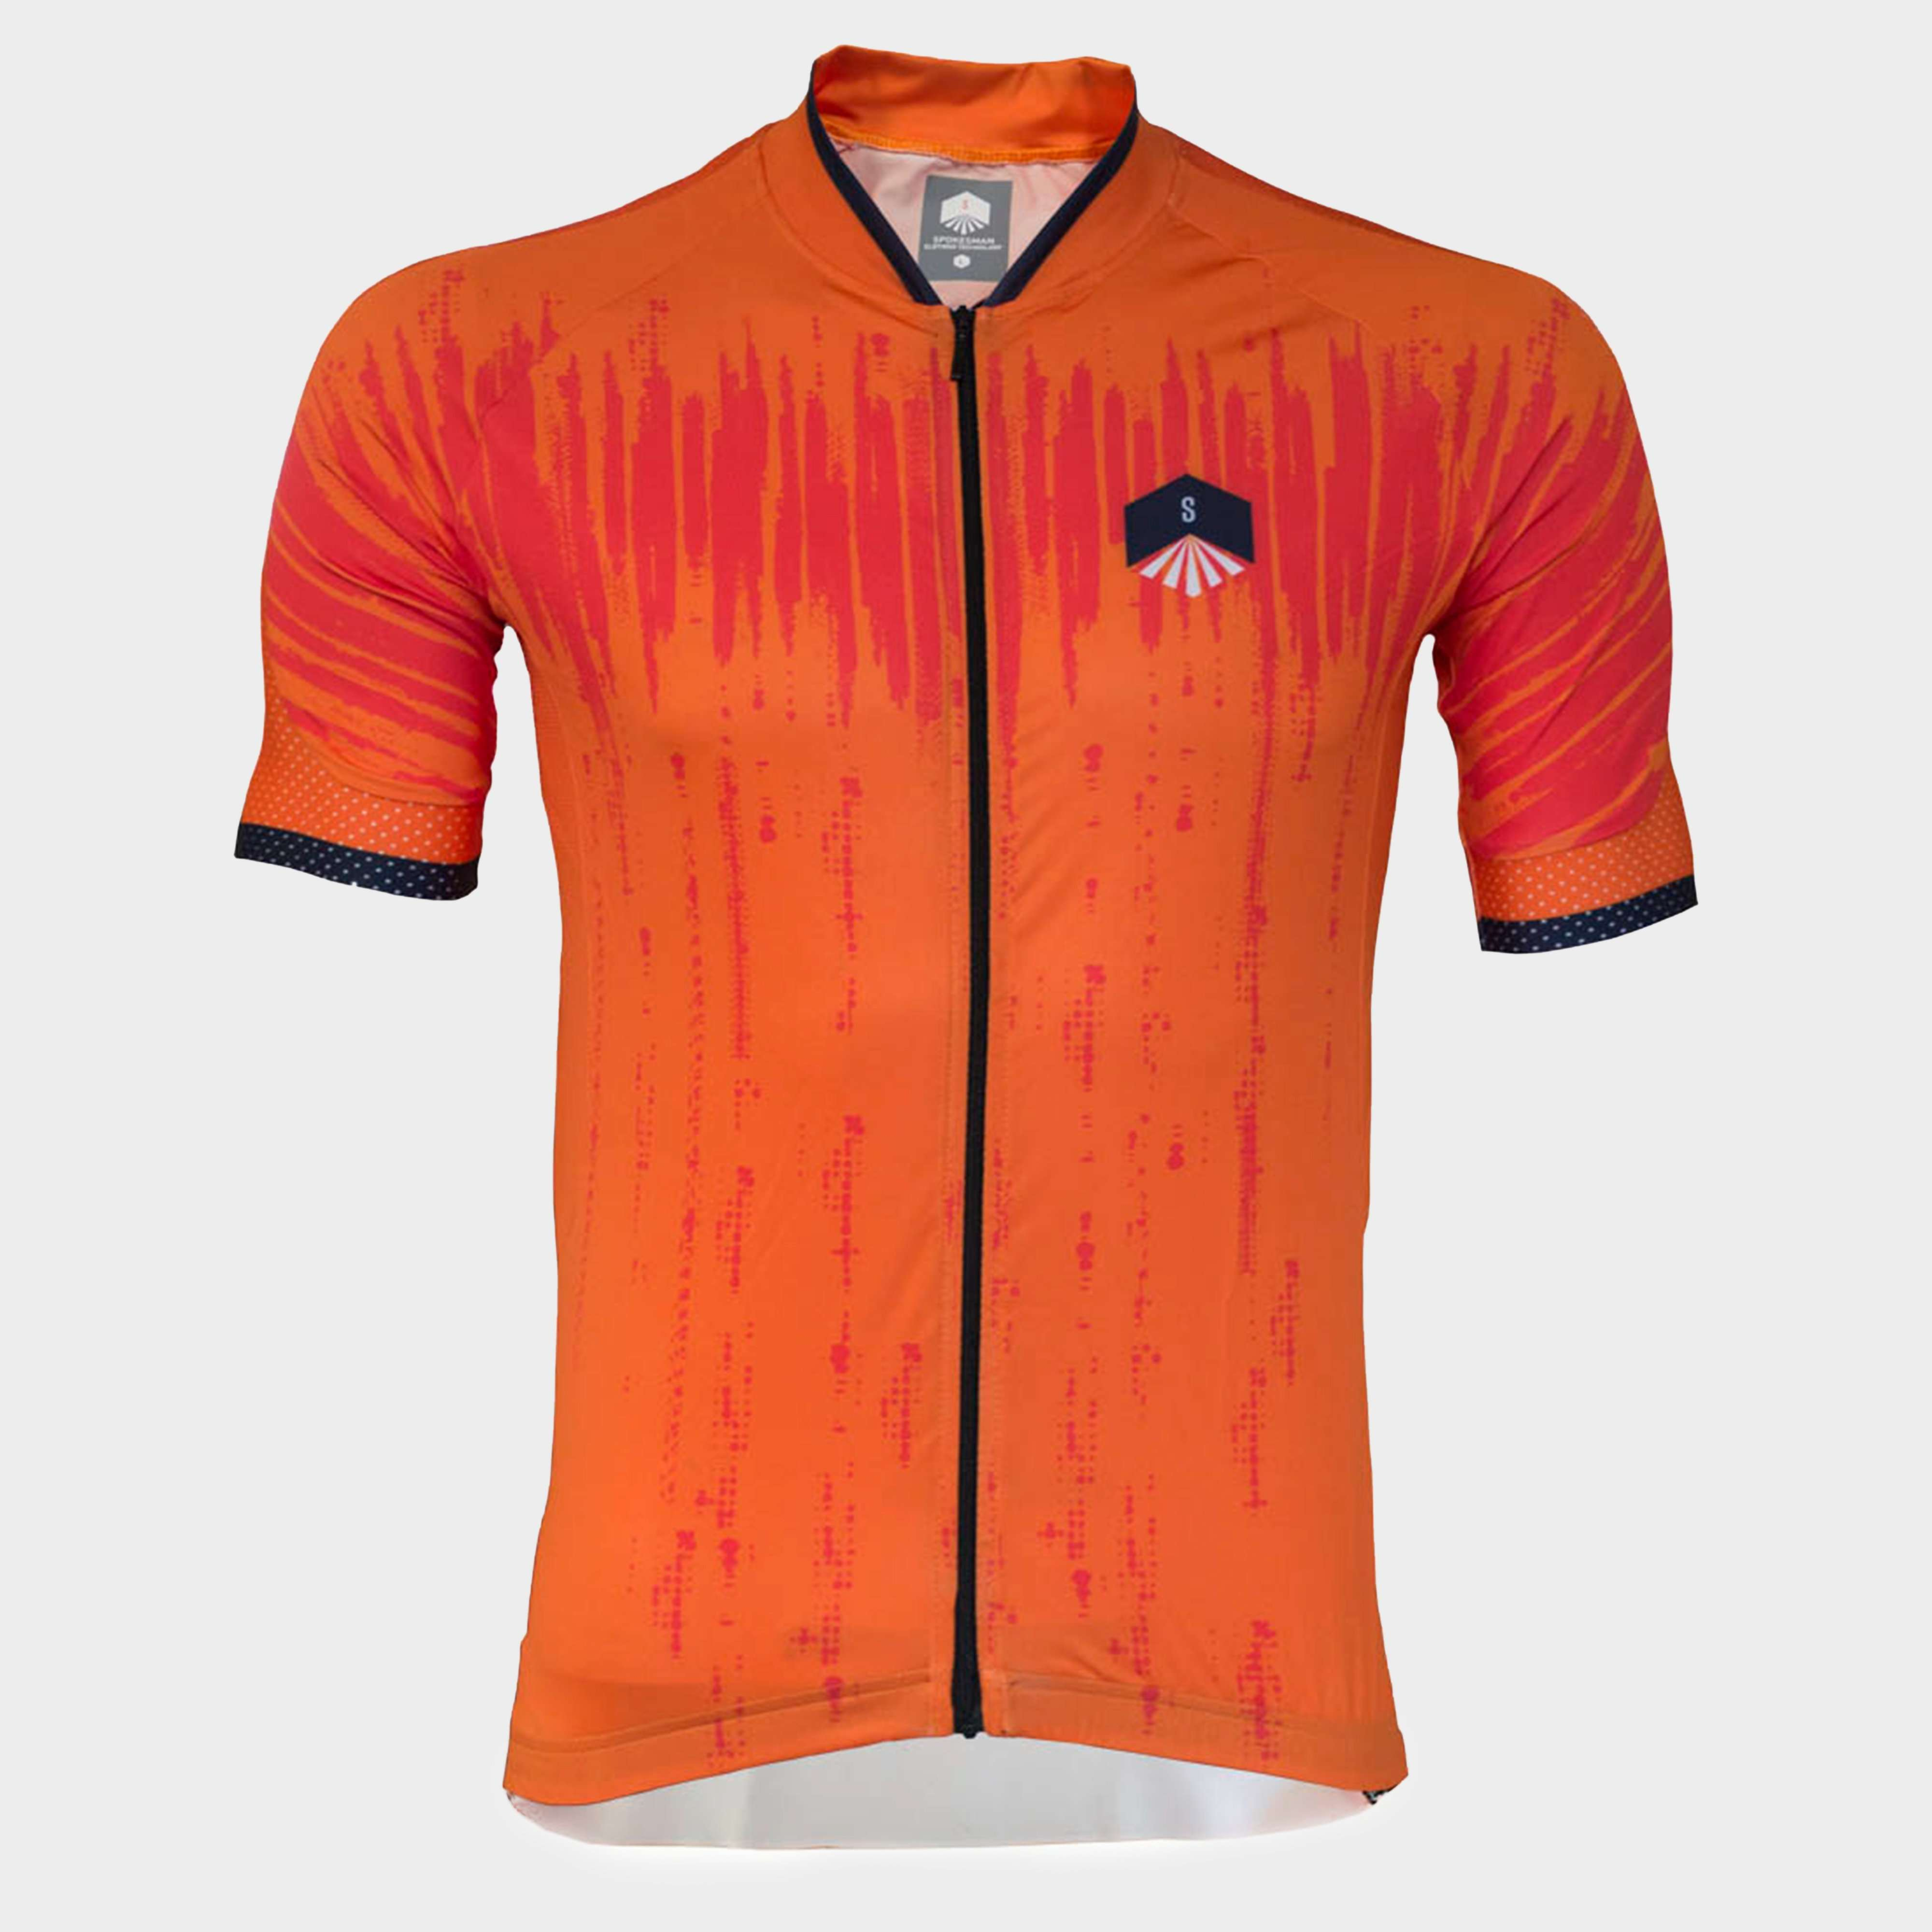 SPOKESMAN Men's Tracker Cycling Jersey